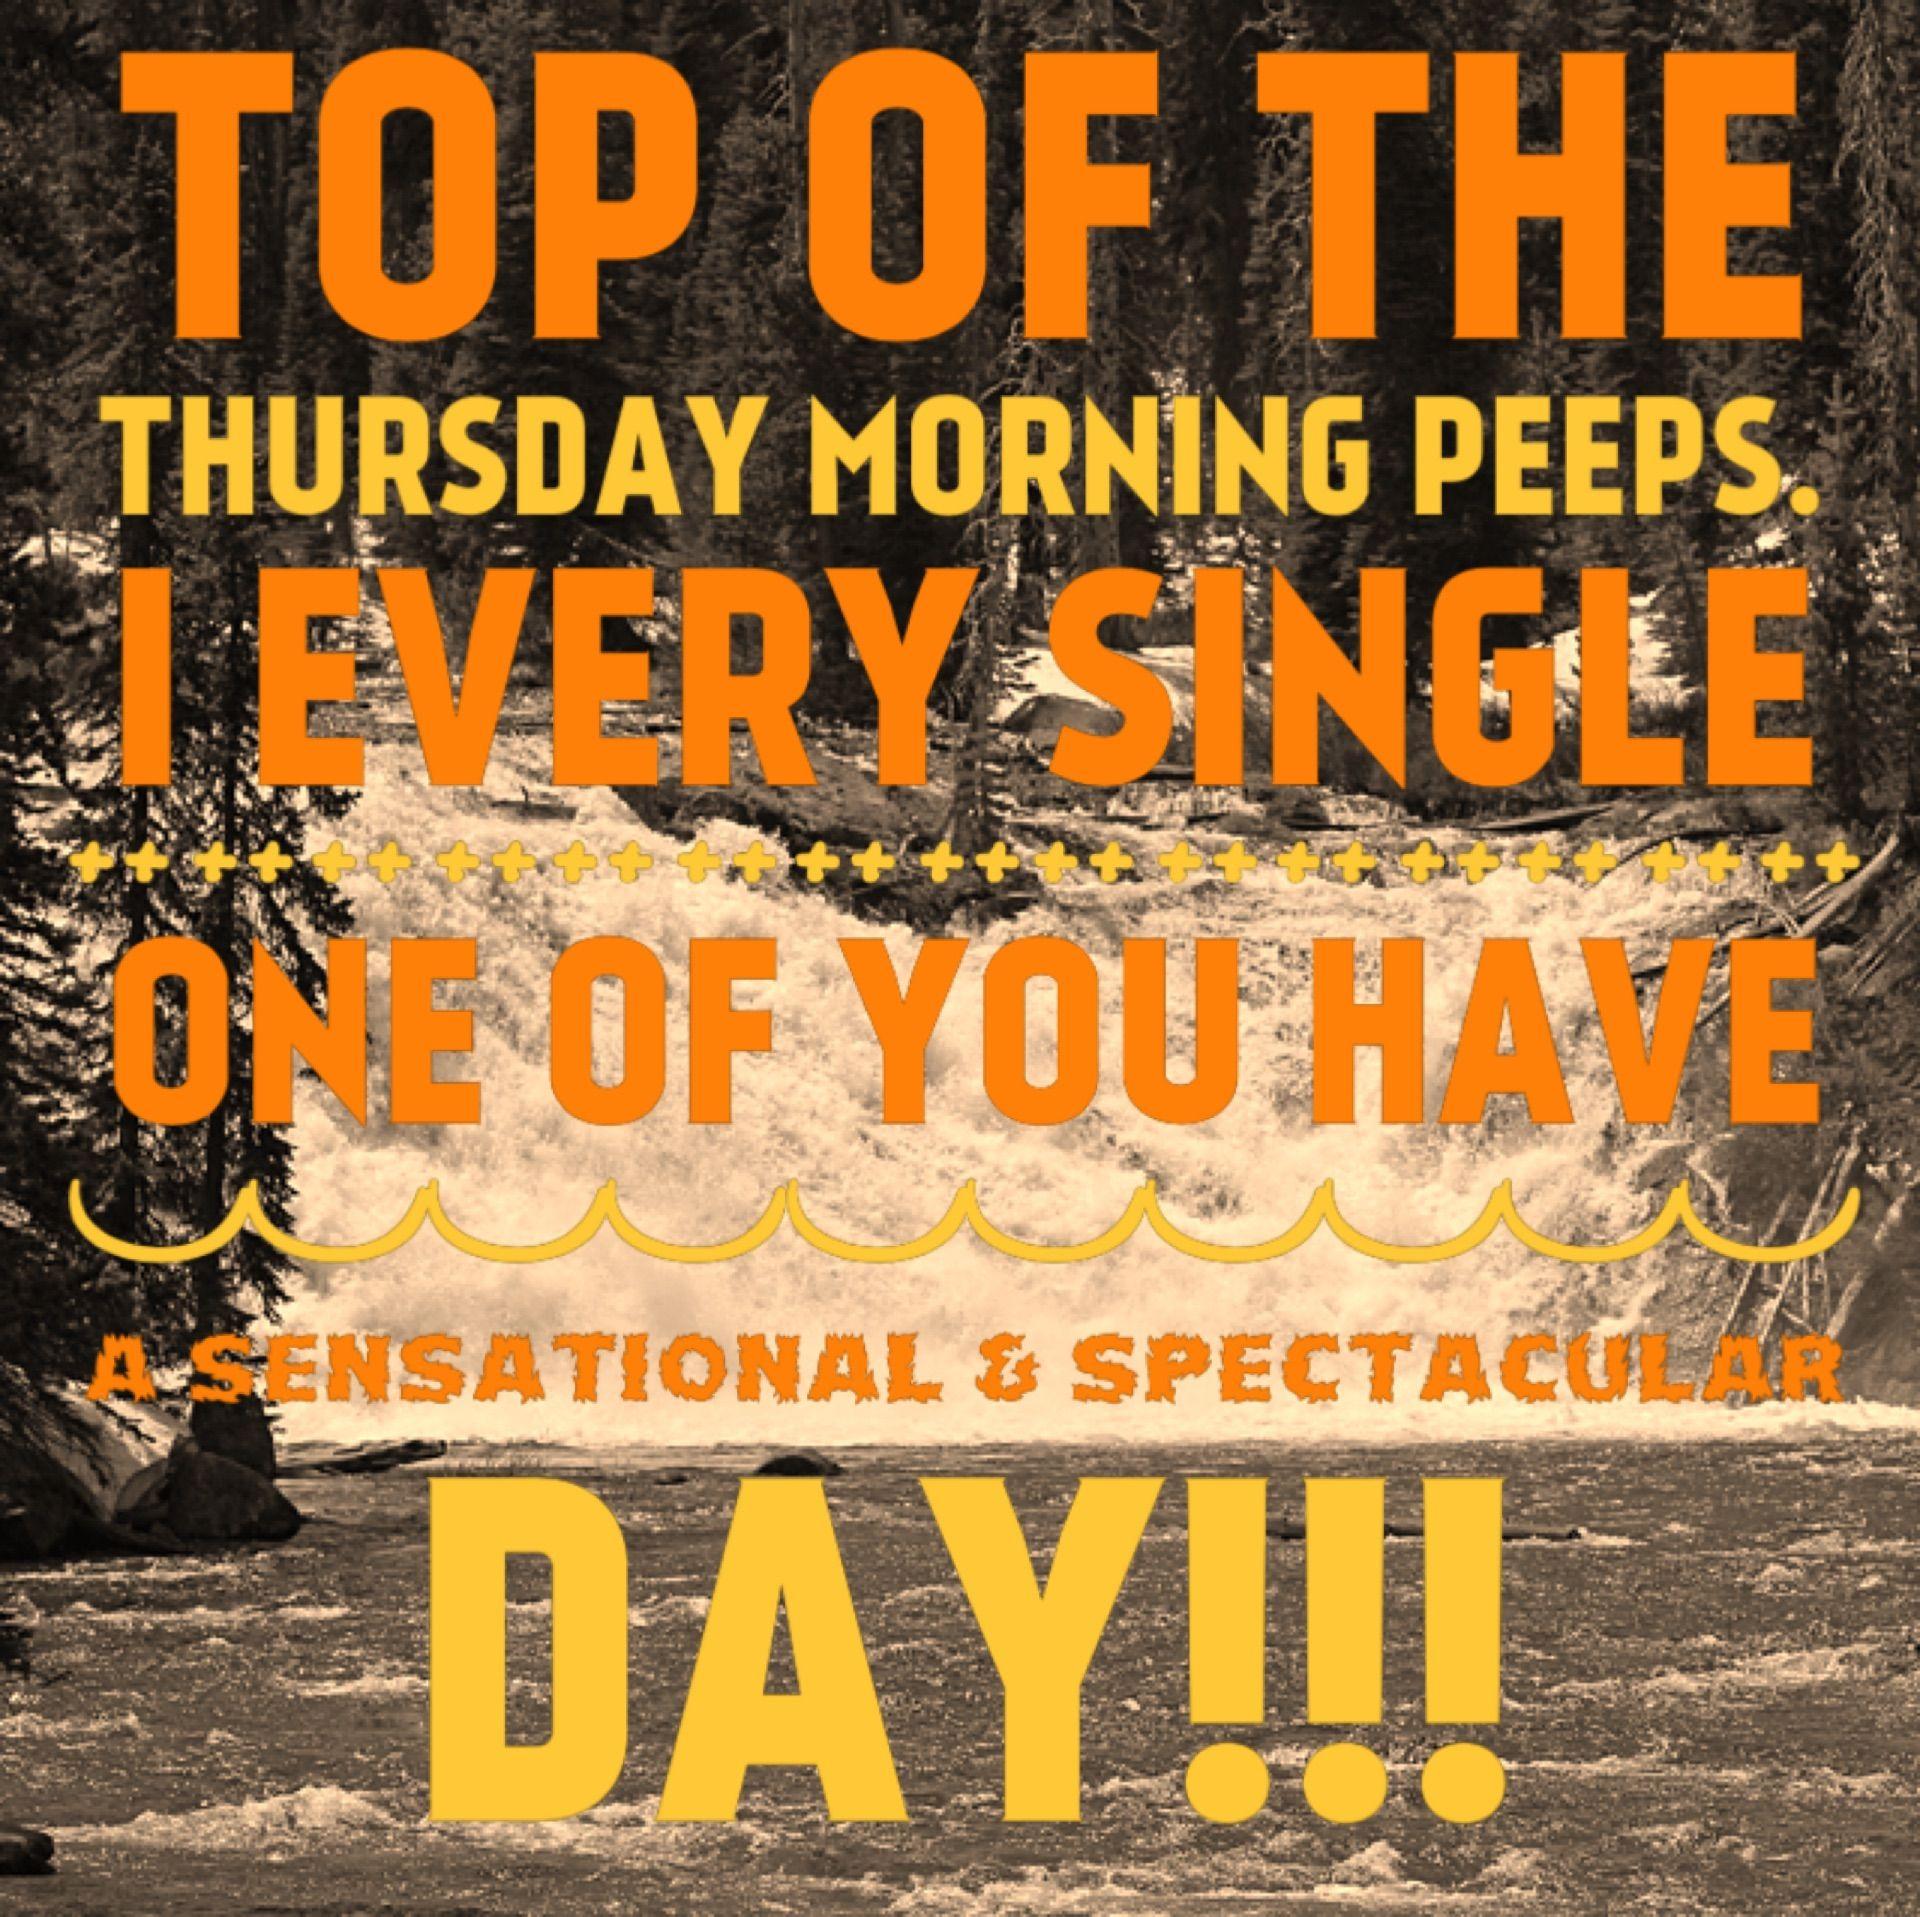 Topofthemorning Thursday Sensational Spectacular